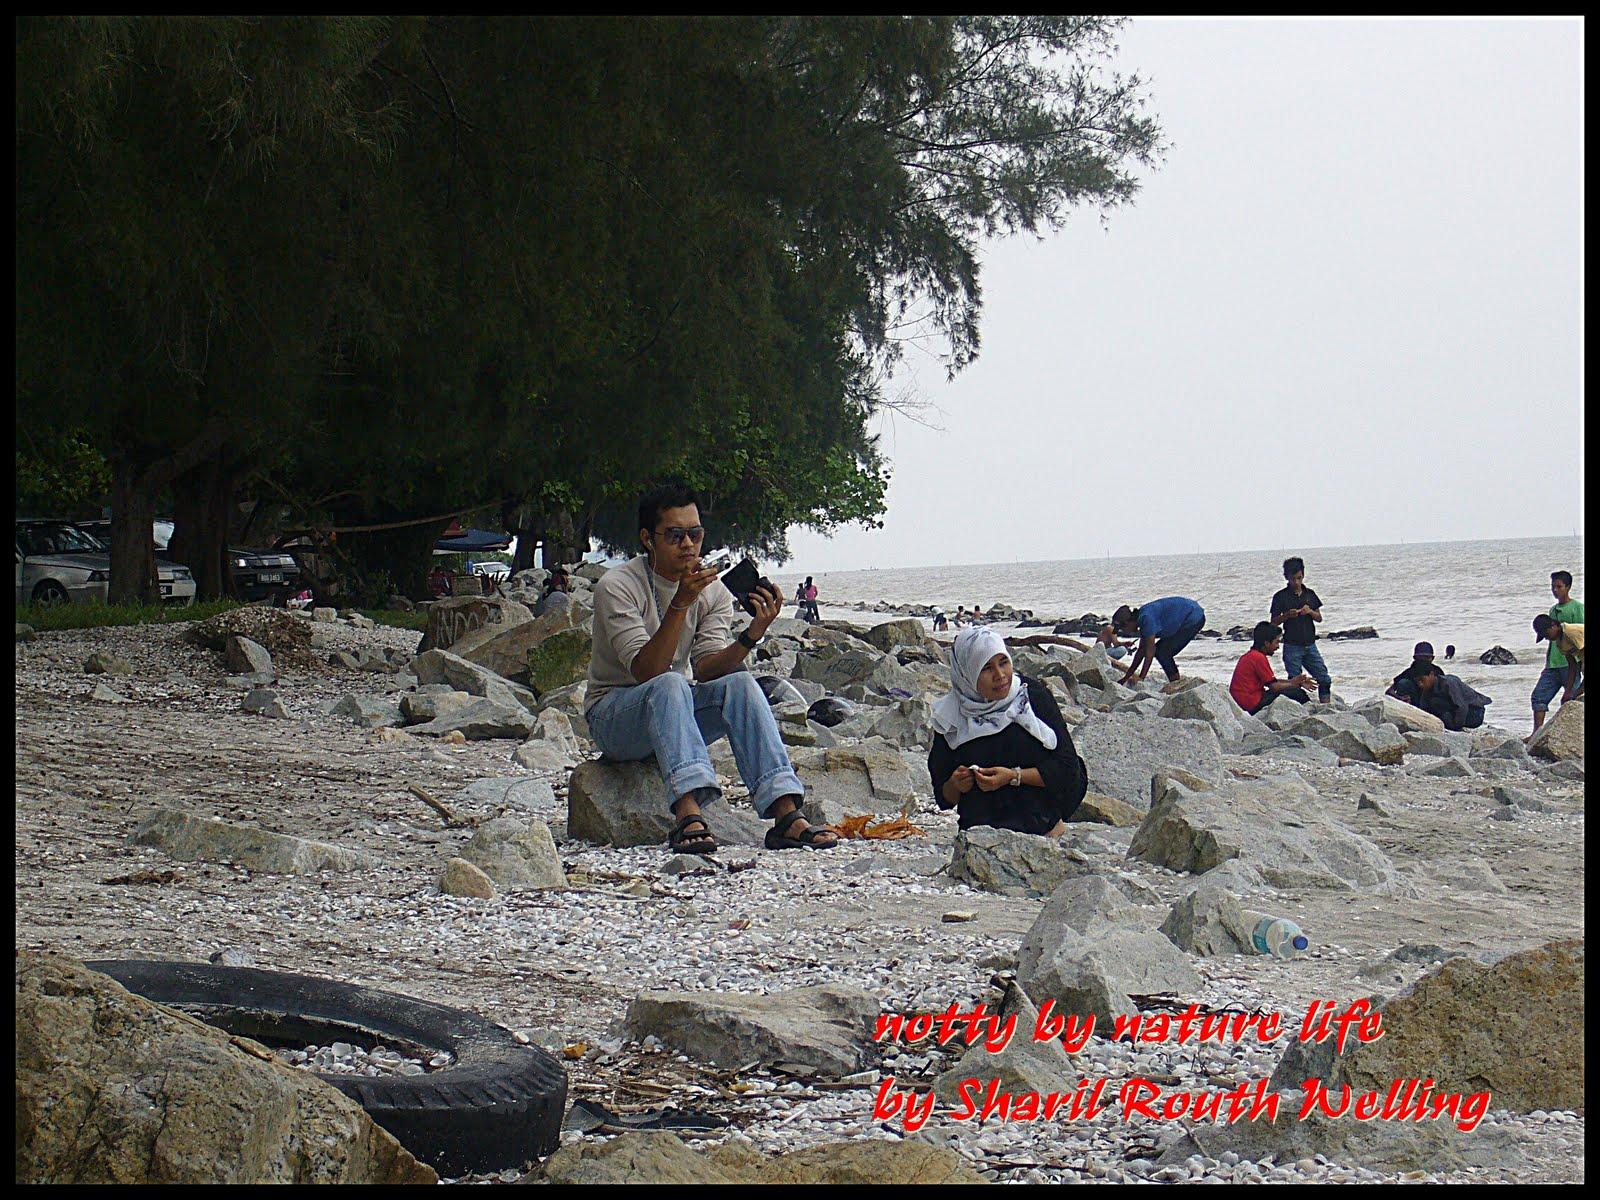 Pantai Remis Malaysia  City pictures : Pantai Remis, Kuala Selangor ~ Notty by Nature Life Chapter 1